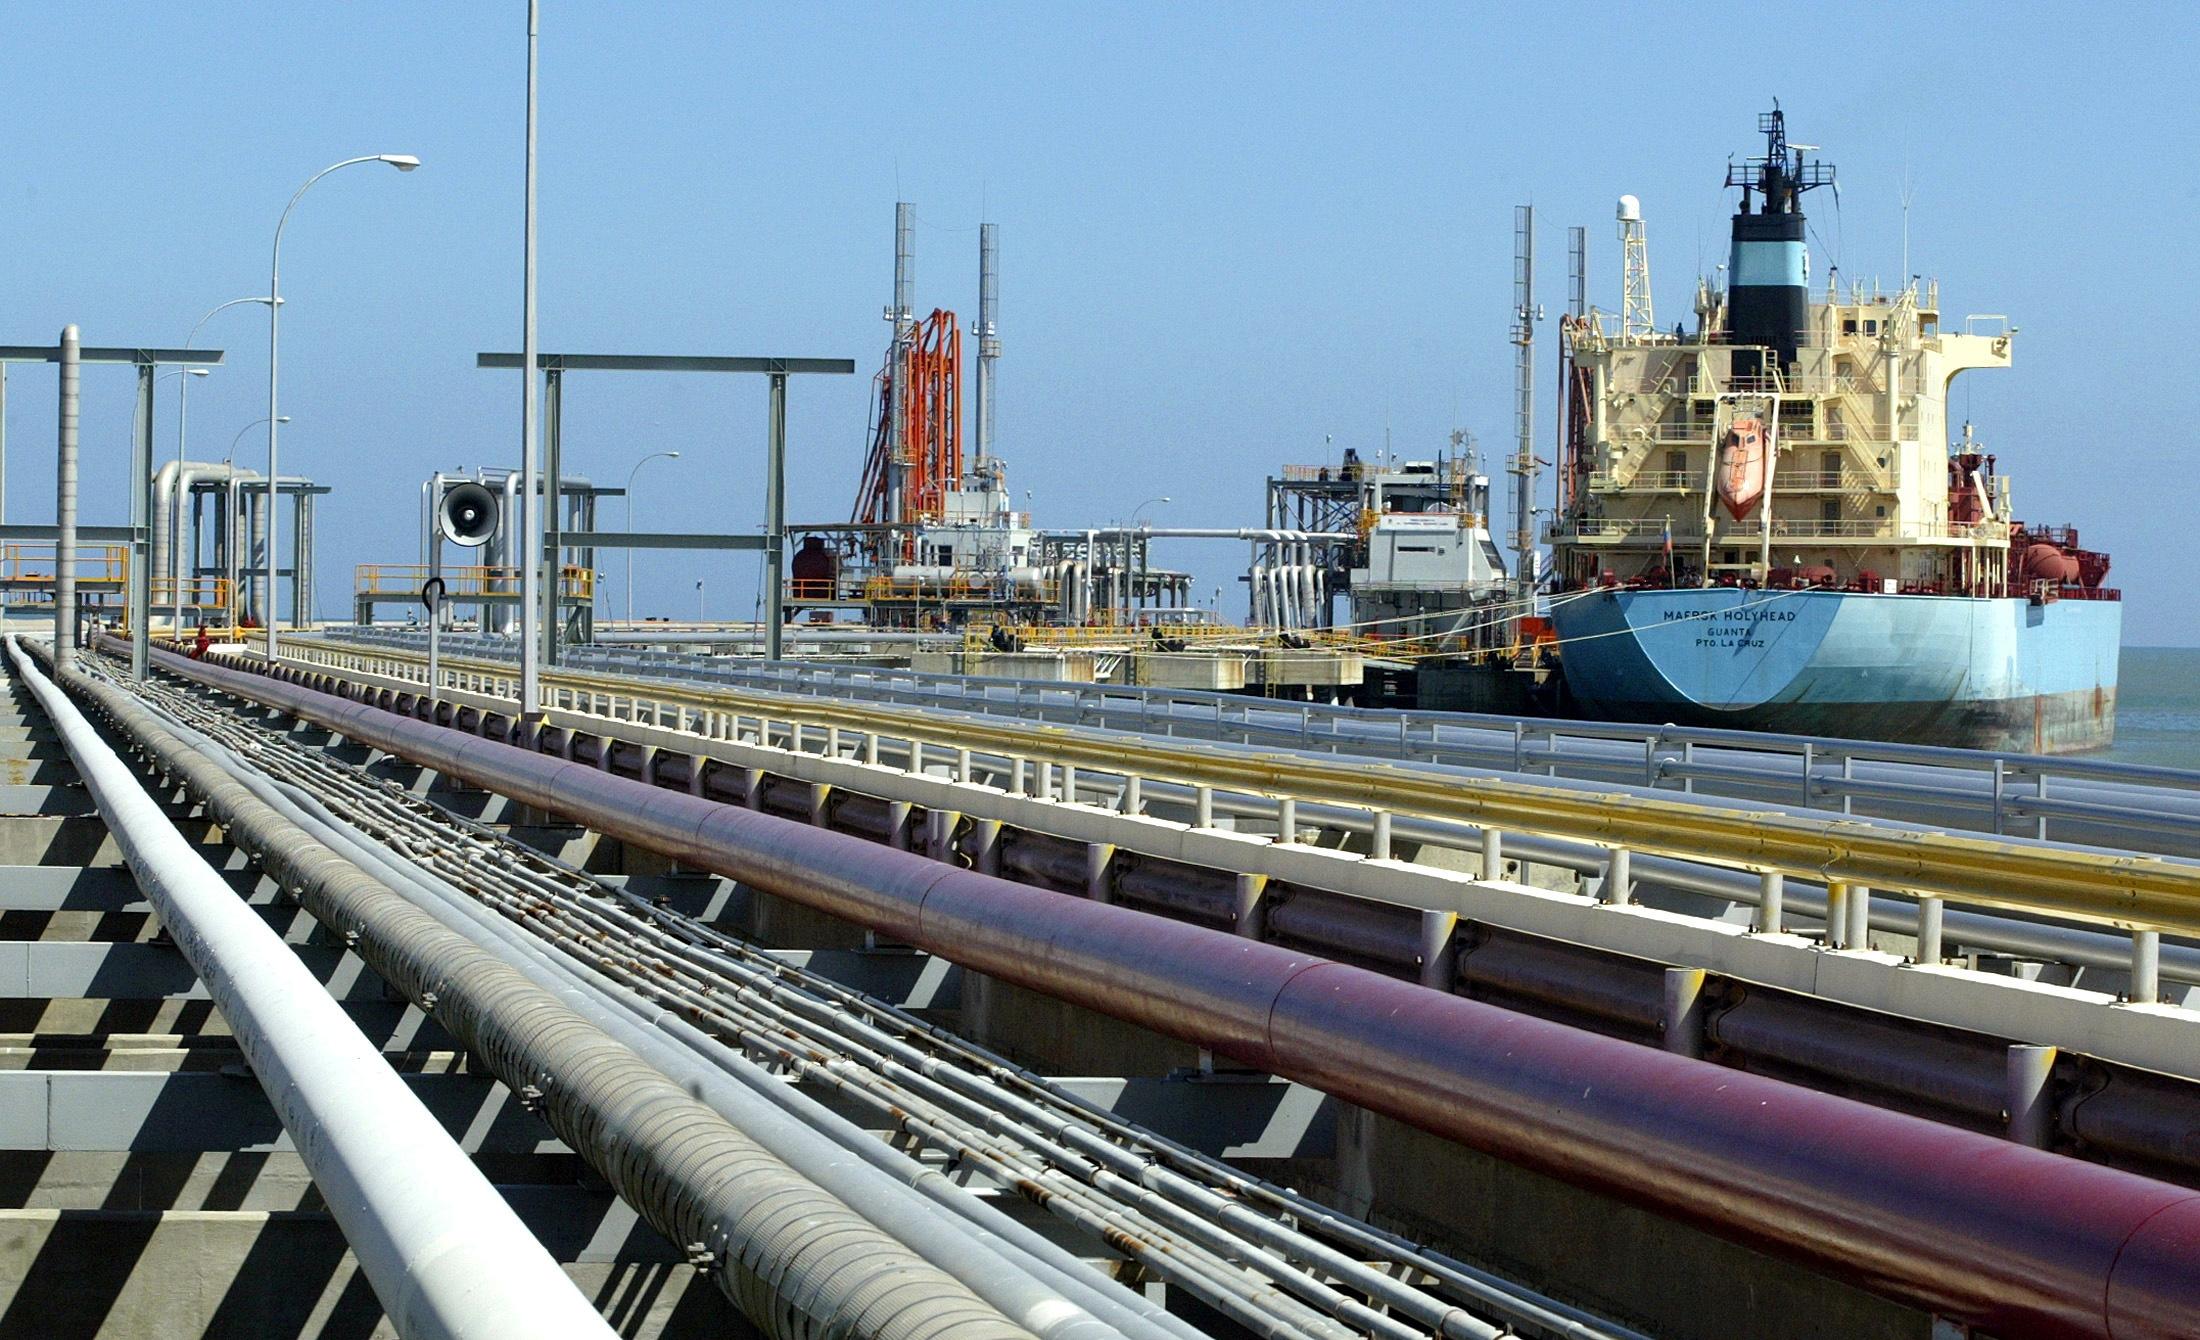 Under U.S. sanctions, Iran and Venezuela strike oil export deal